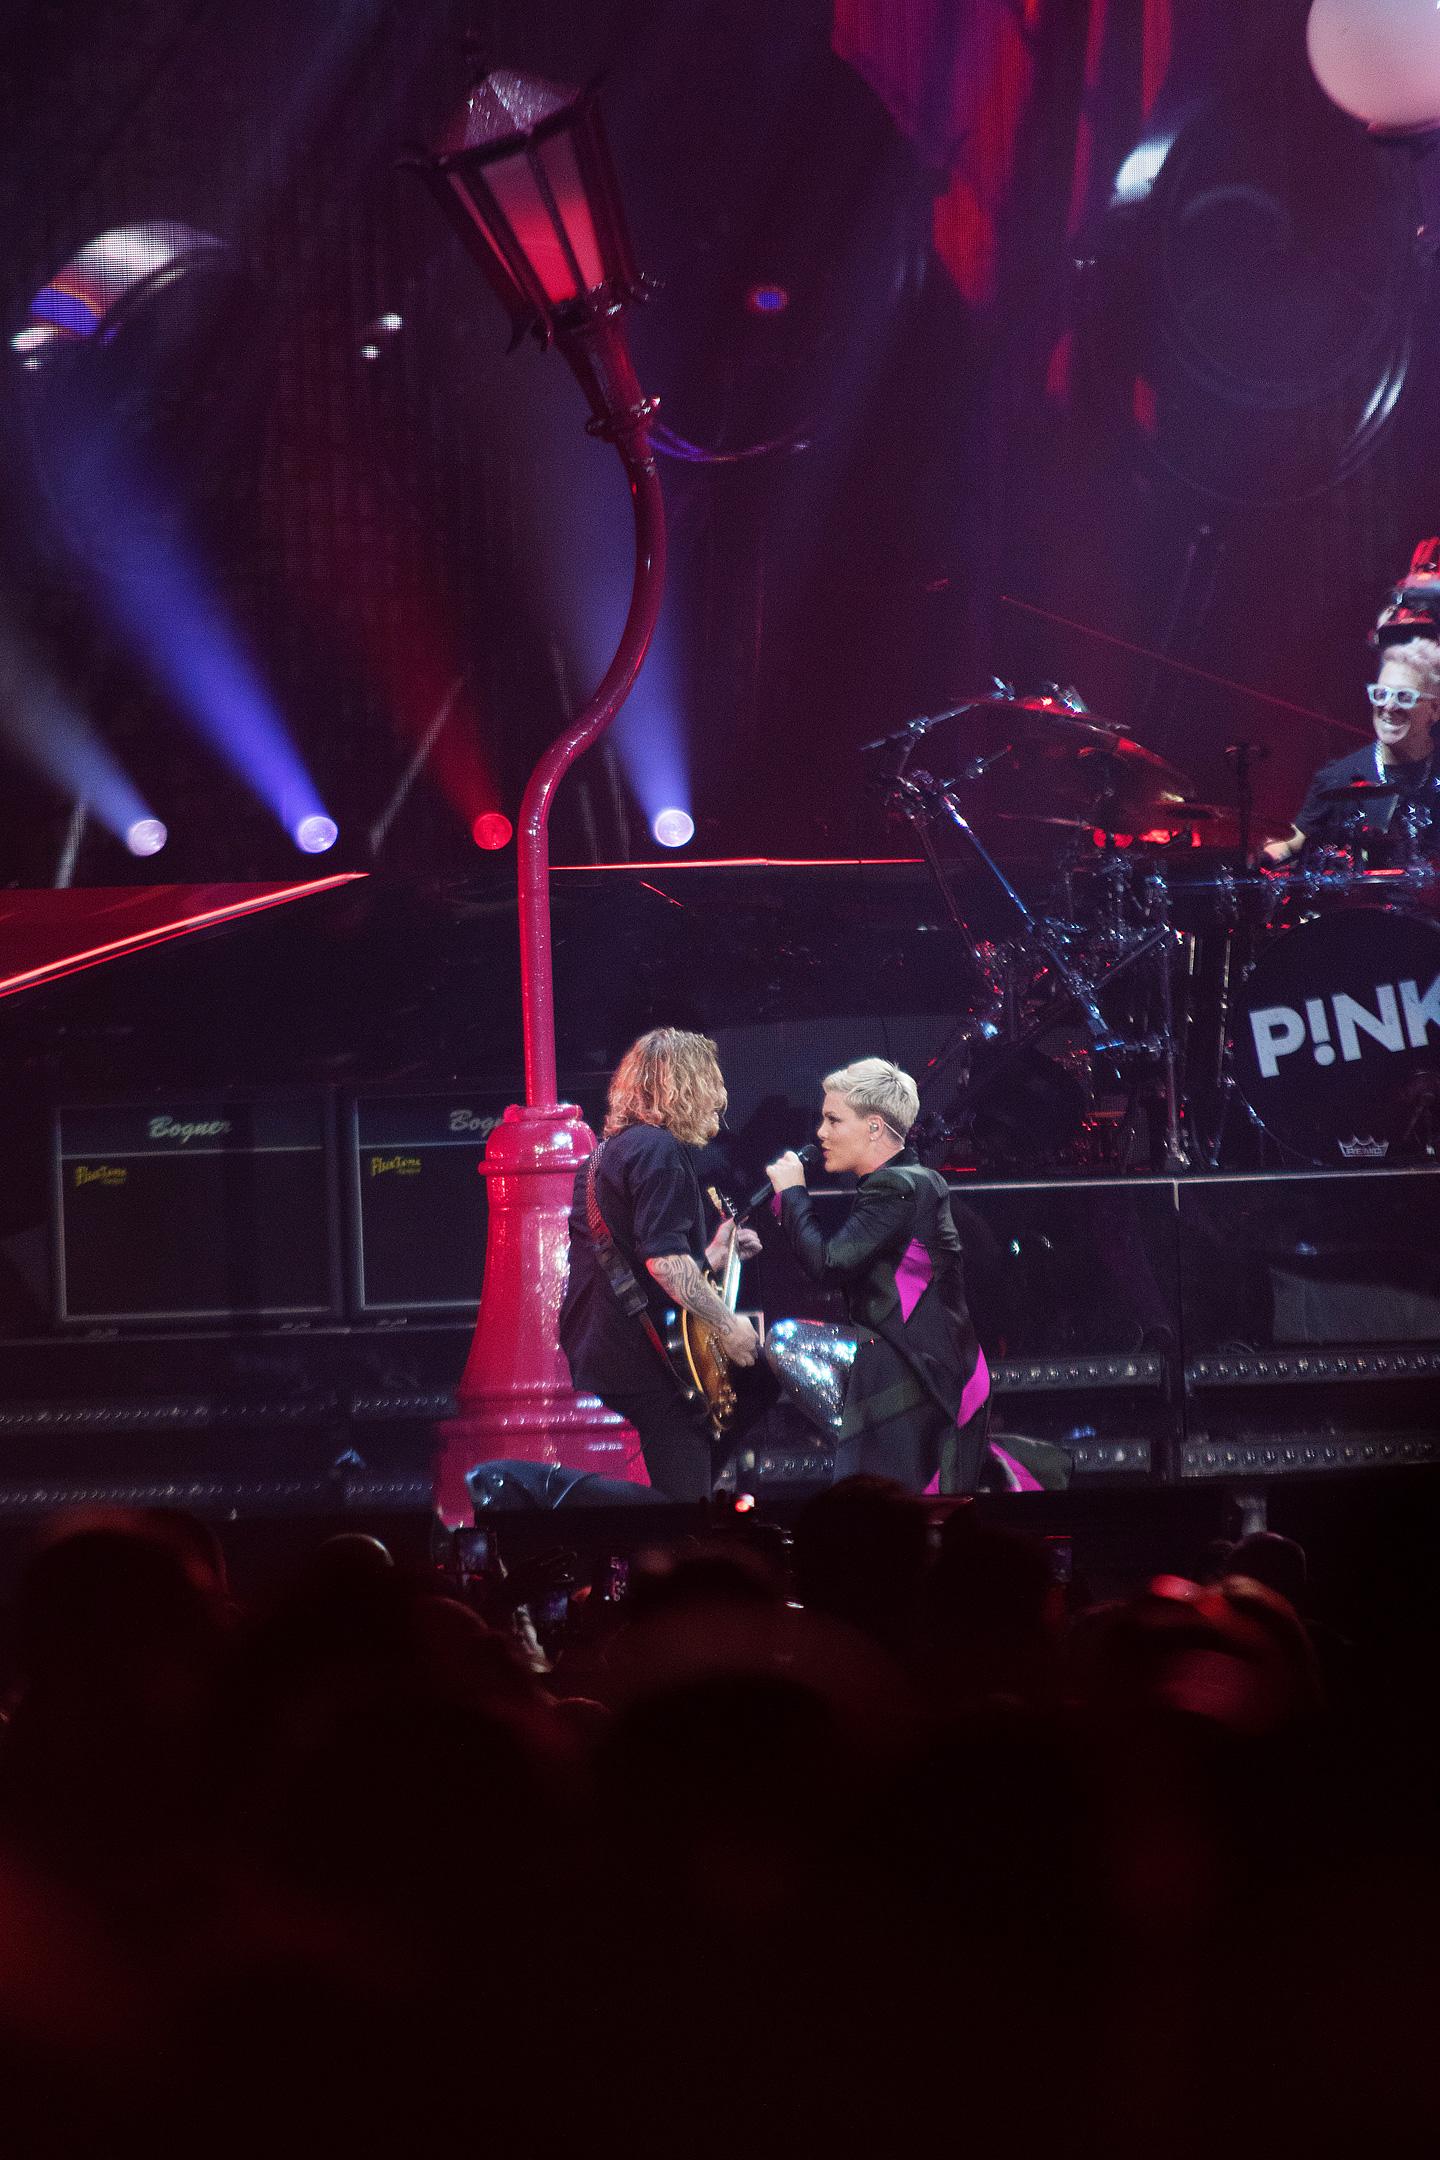 Pink - Concert Photos - Denver - Beautiful Trauma Tour 2018